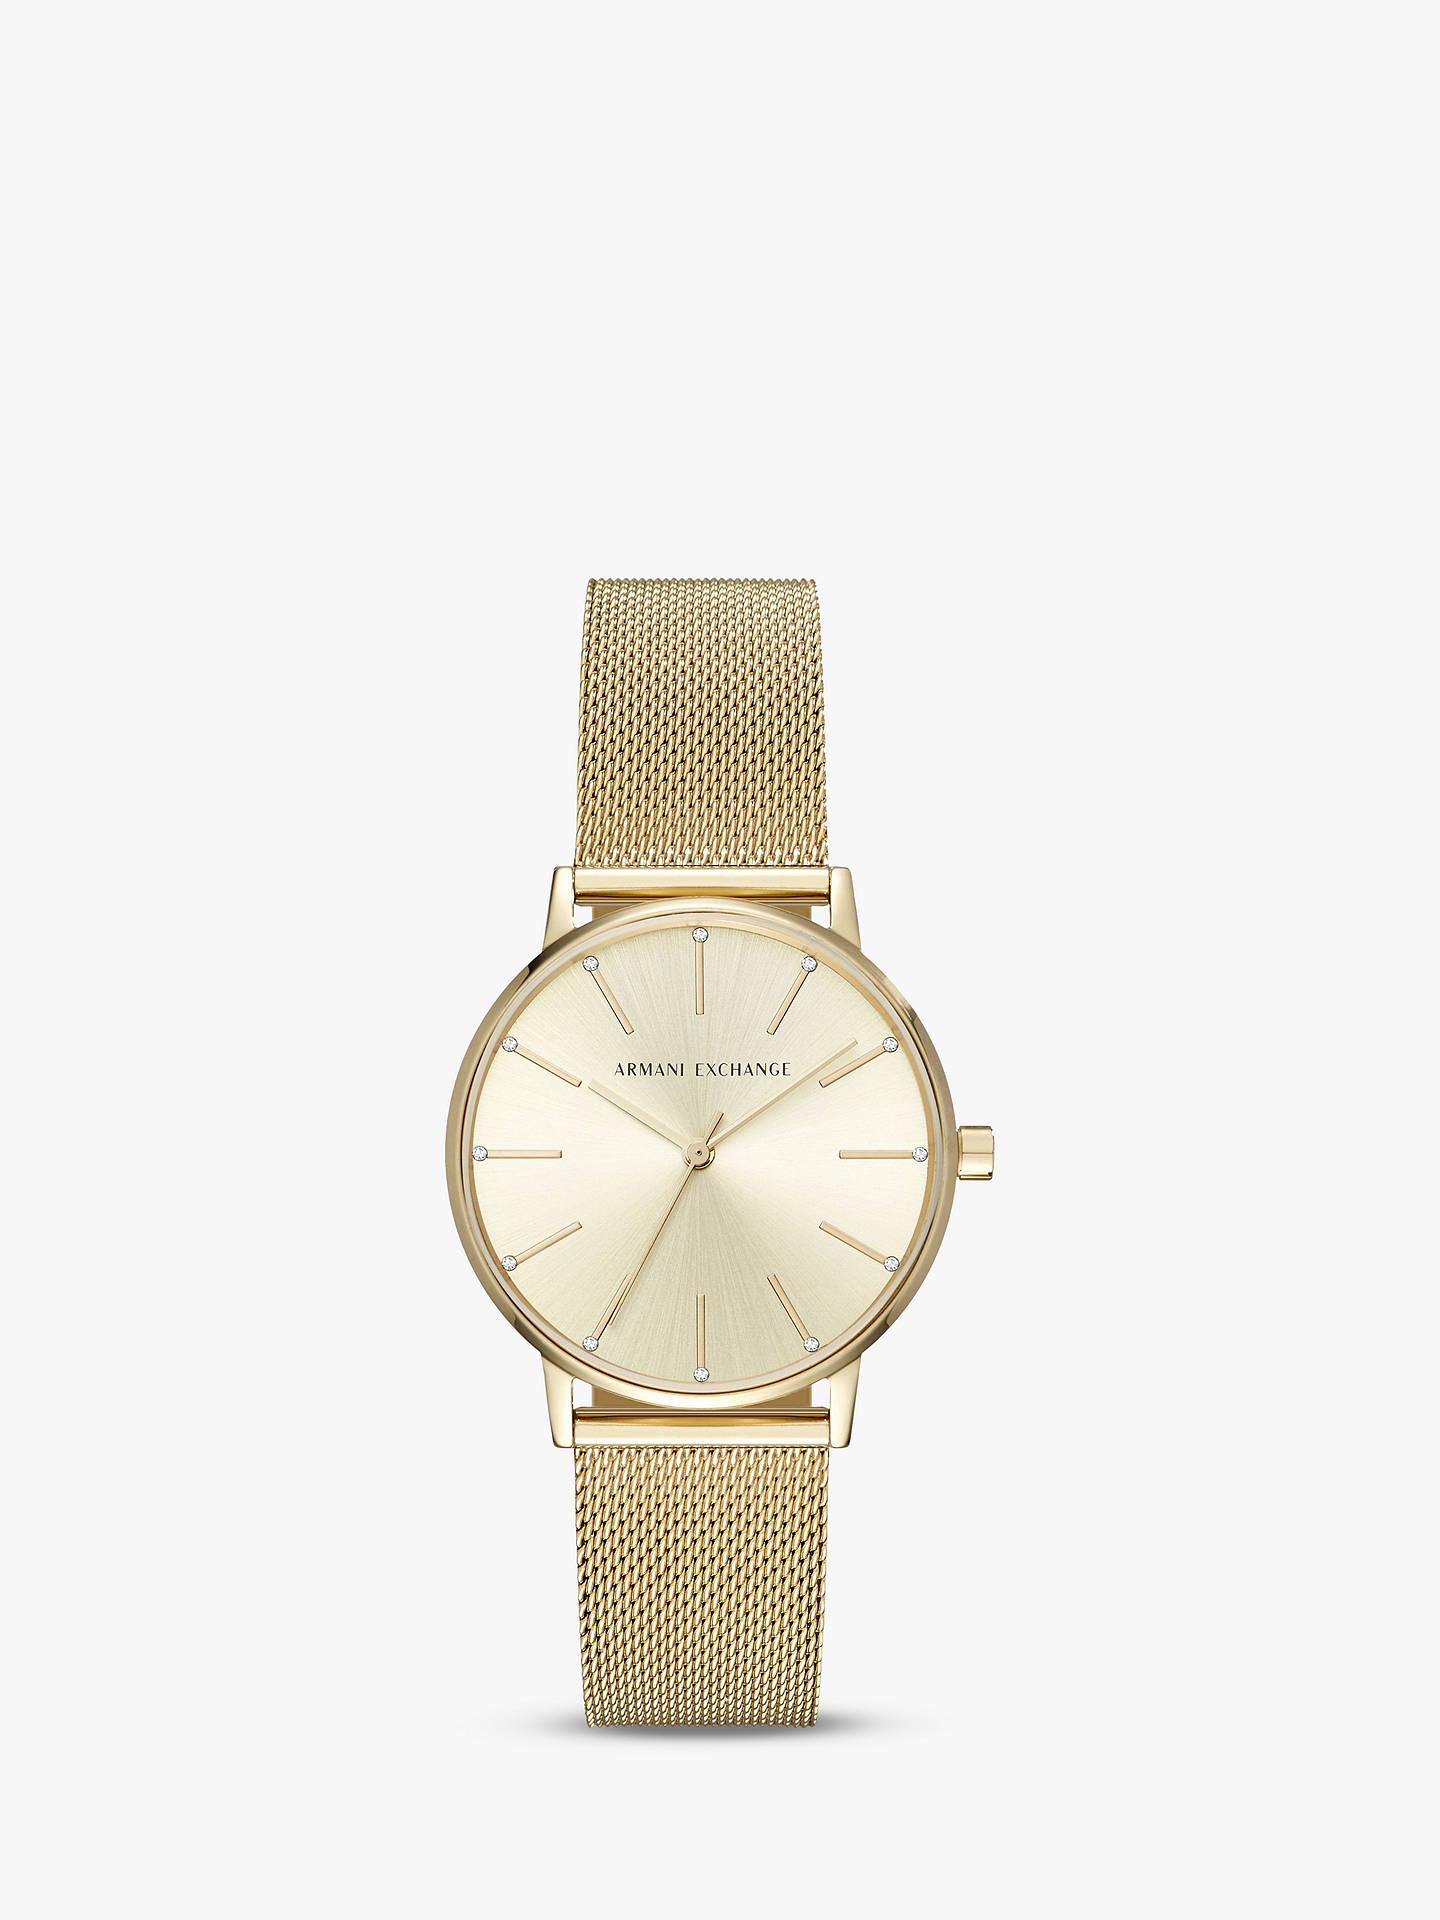 Armani Exchange Women s Mesh Bracelet Strap Watch at John Lewis ... 543281fc95